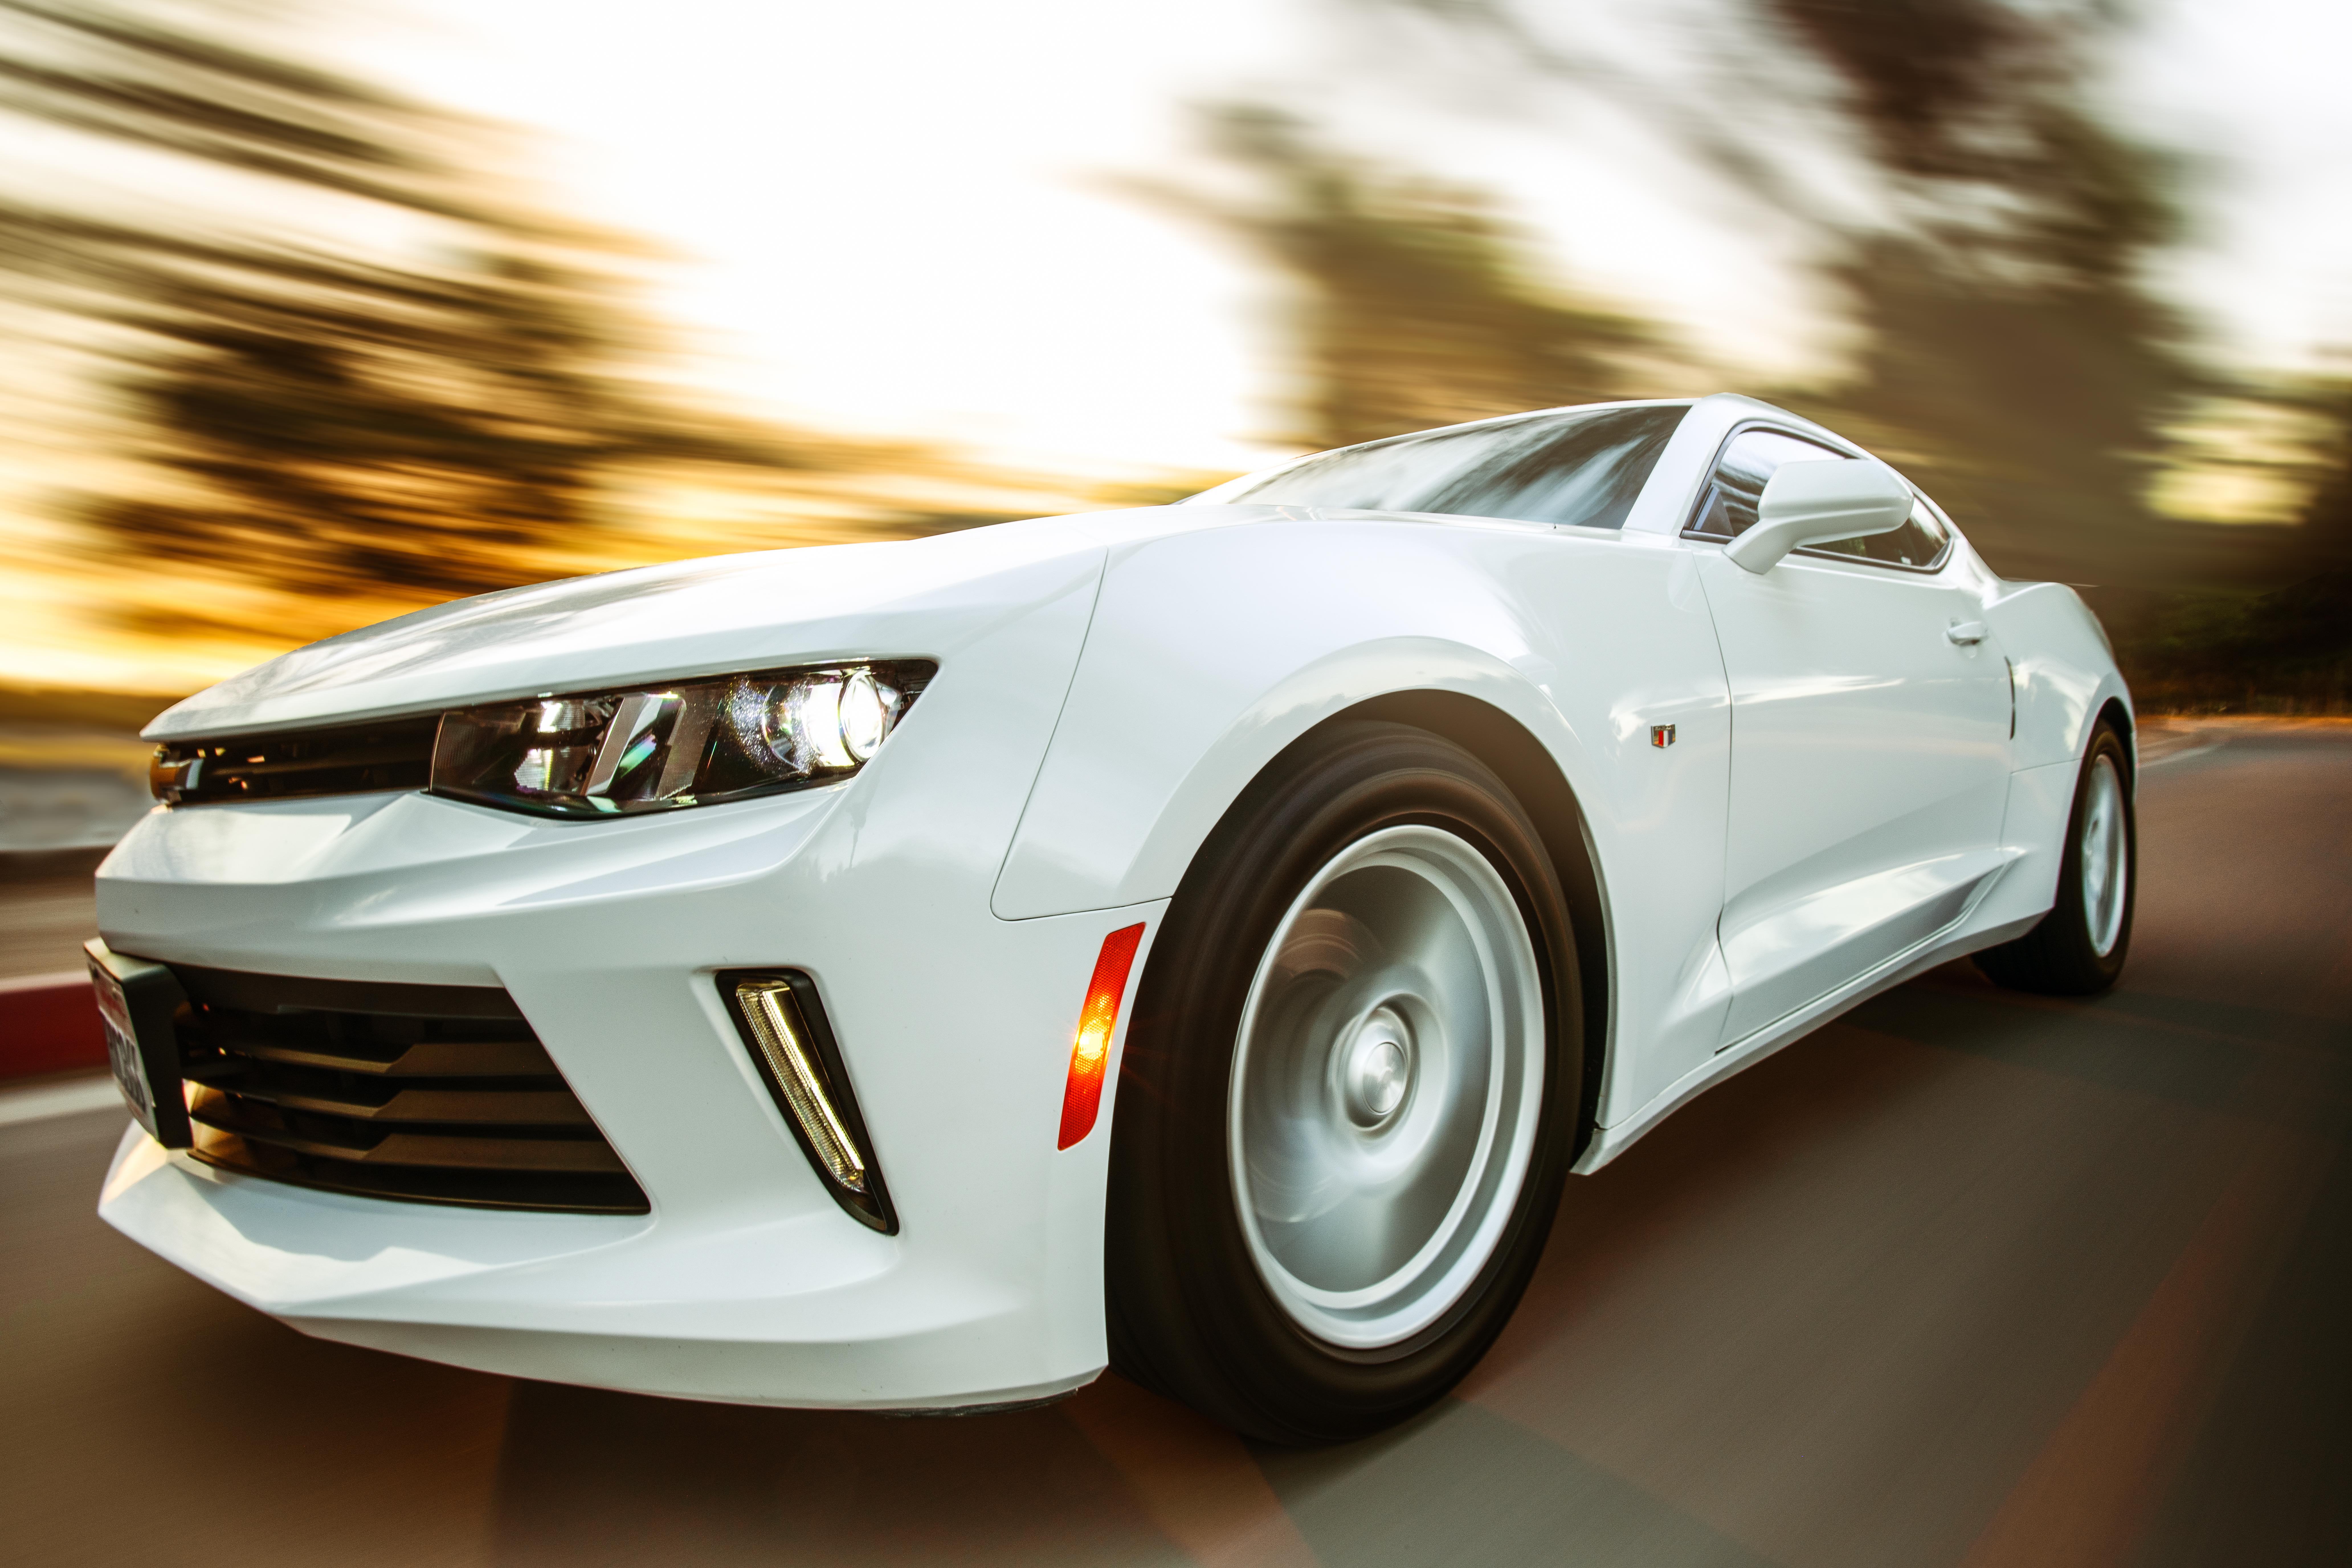 Close-Up Photography of White Chevrolet Camaro